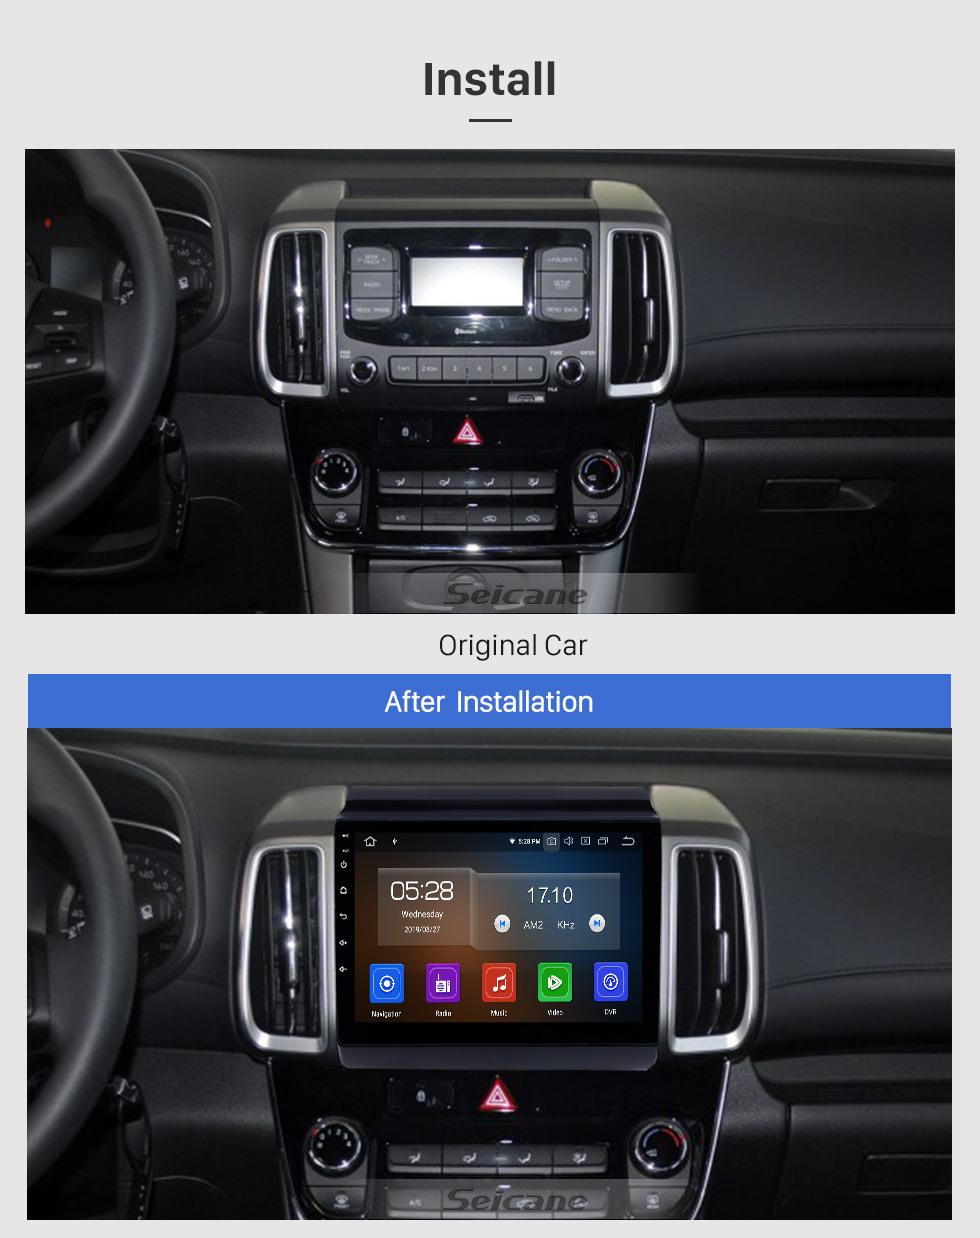 Seicane HD Touchscreen 2018-2019 Hyundai ix35 Android 10.0 9 inch GPS Navigation Radio Bluetooth Carplay AUX Music support SWC OBD2 Mirror Link Backup camera